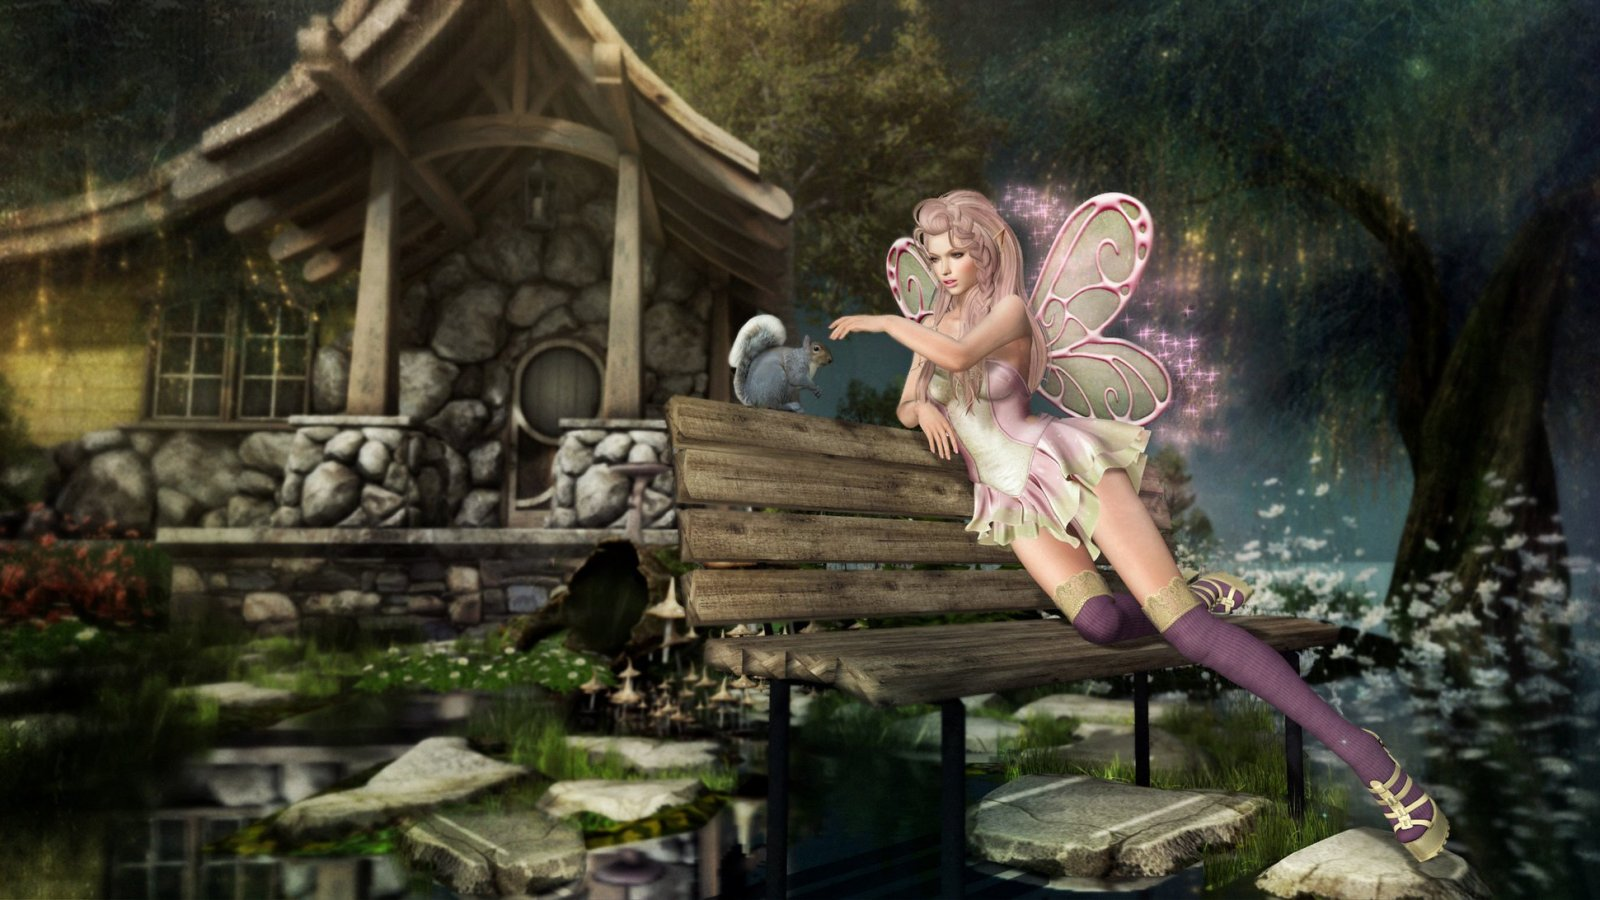 Lua's Fairy Godmother